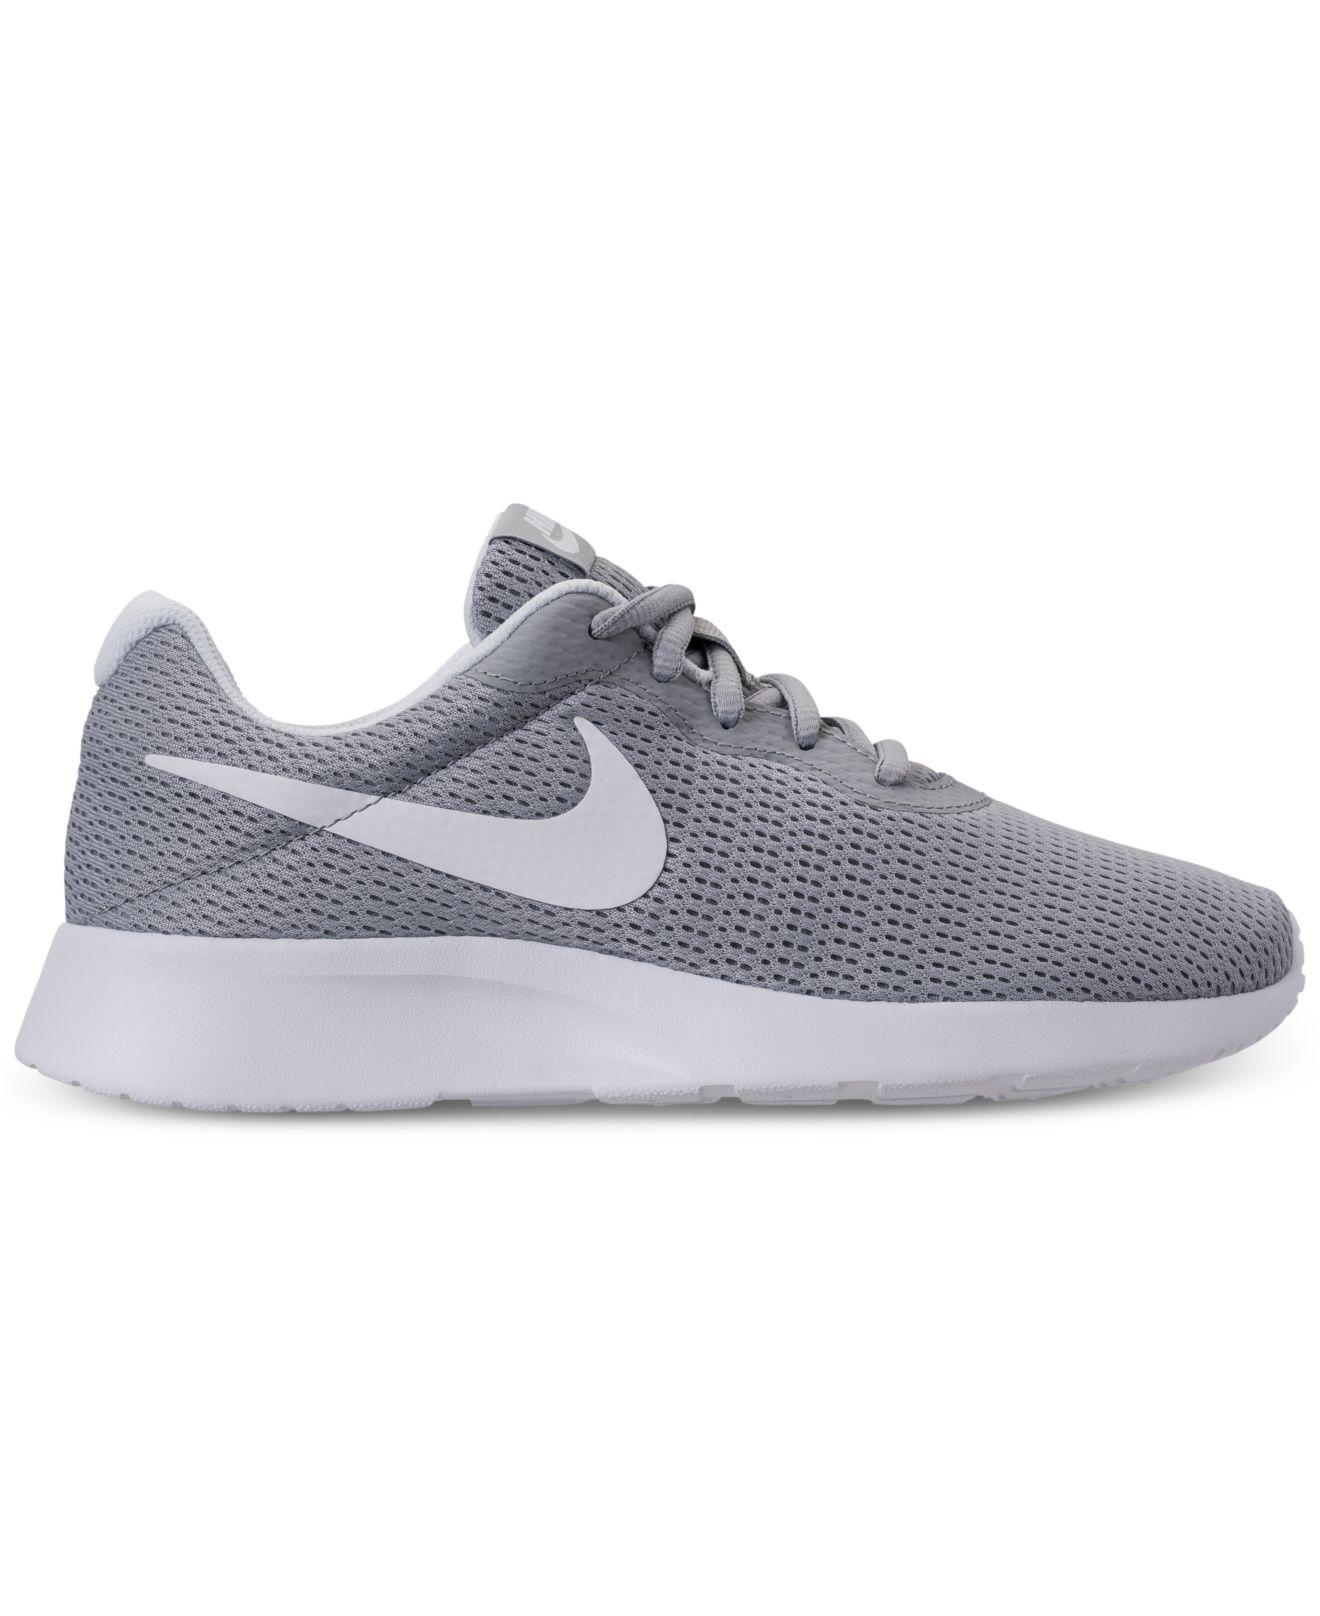 59b578dab66aa Lyst - Nike Tanjun Wide Width (2e) Casual Sneakers From Finish Line in Gray